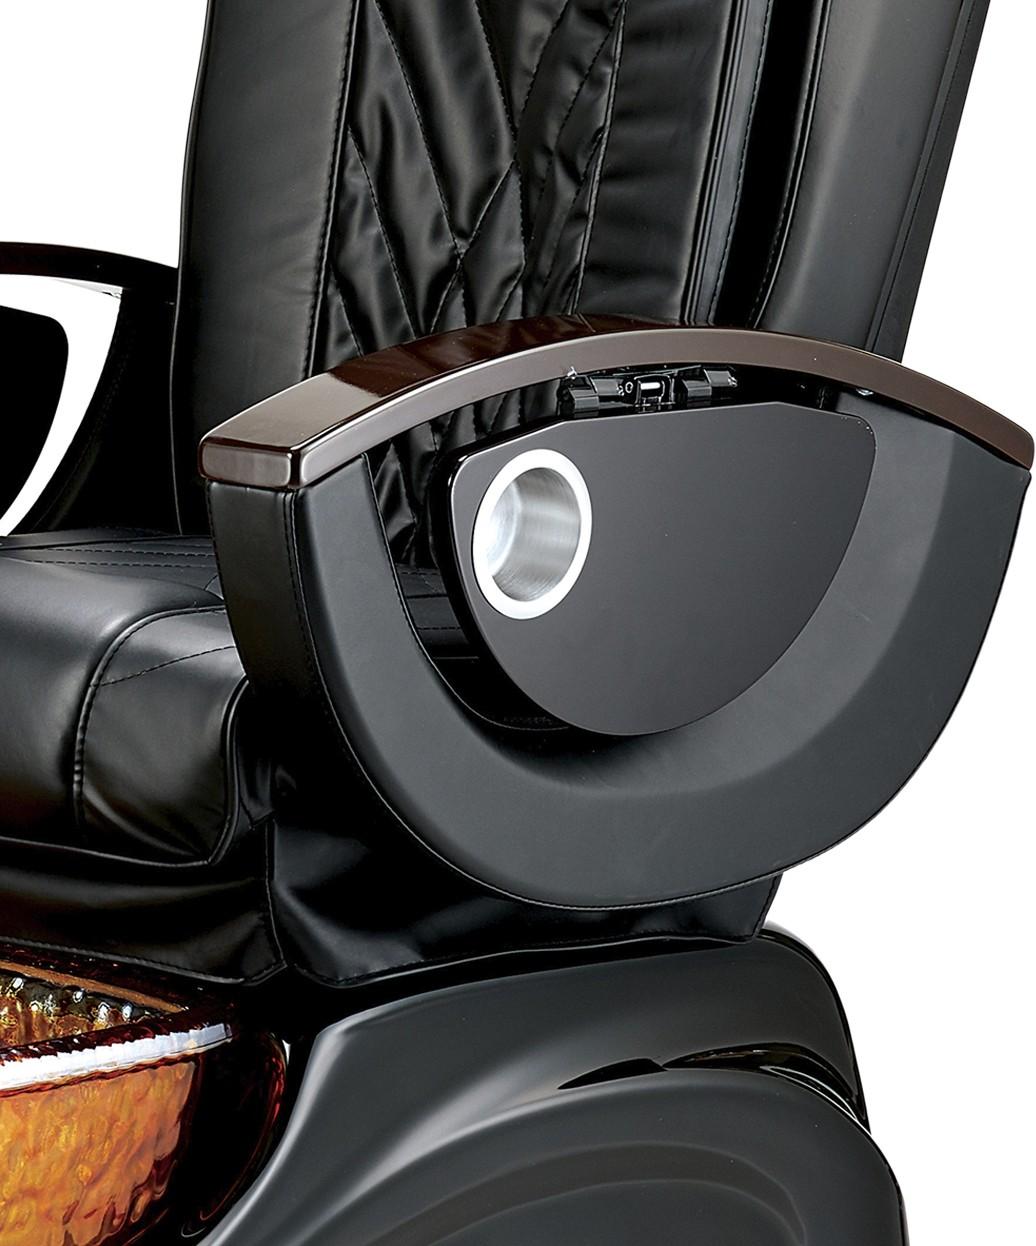 Pibbs PS60 Siena Pipeless Pedicure Spa With Shiatsu Massage